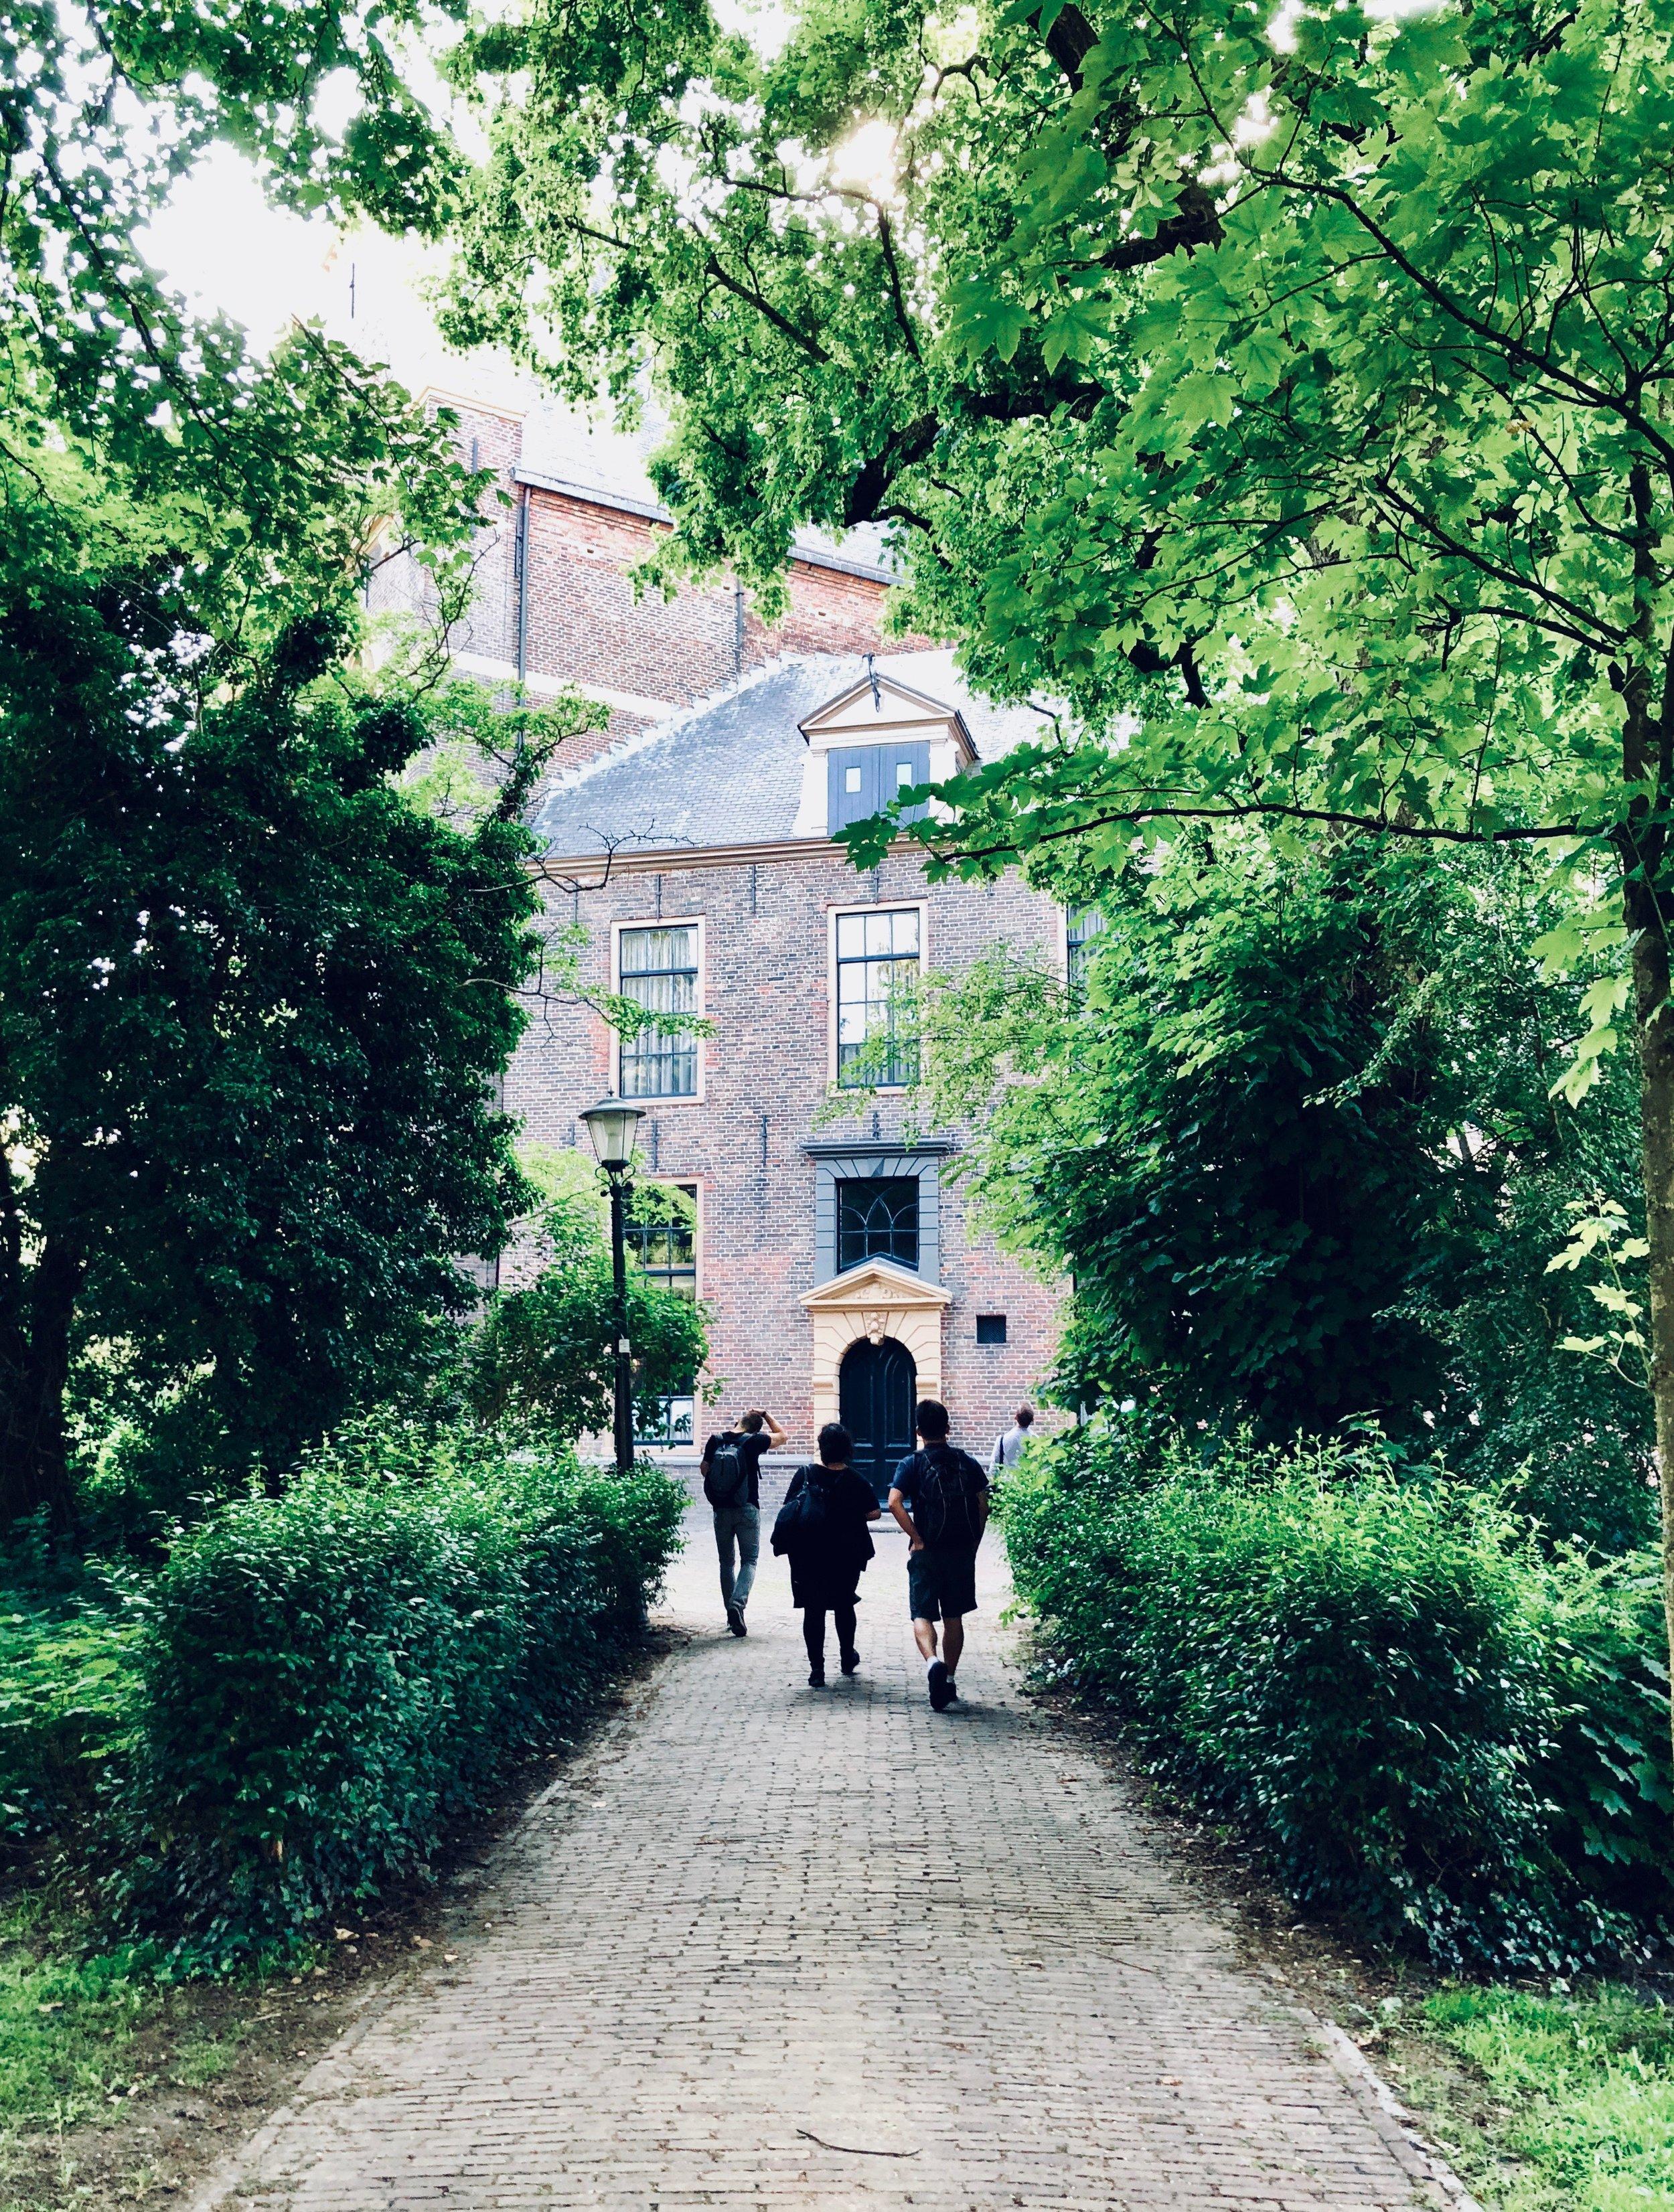 Approaching the Nieuwe Kerk, Groningen.